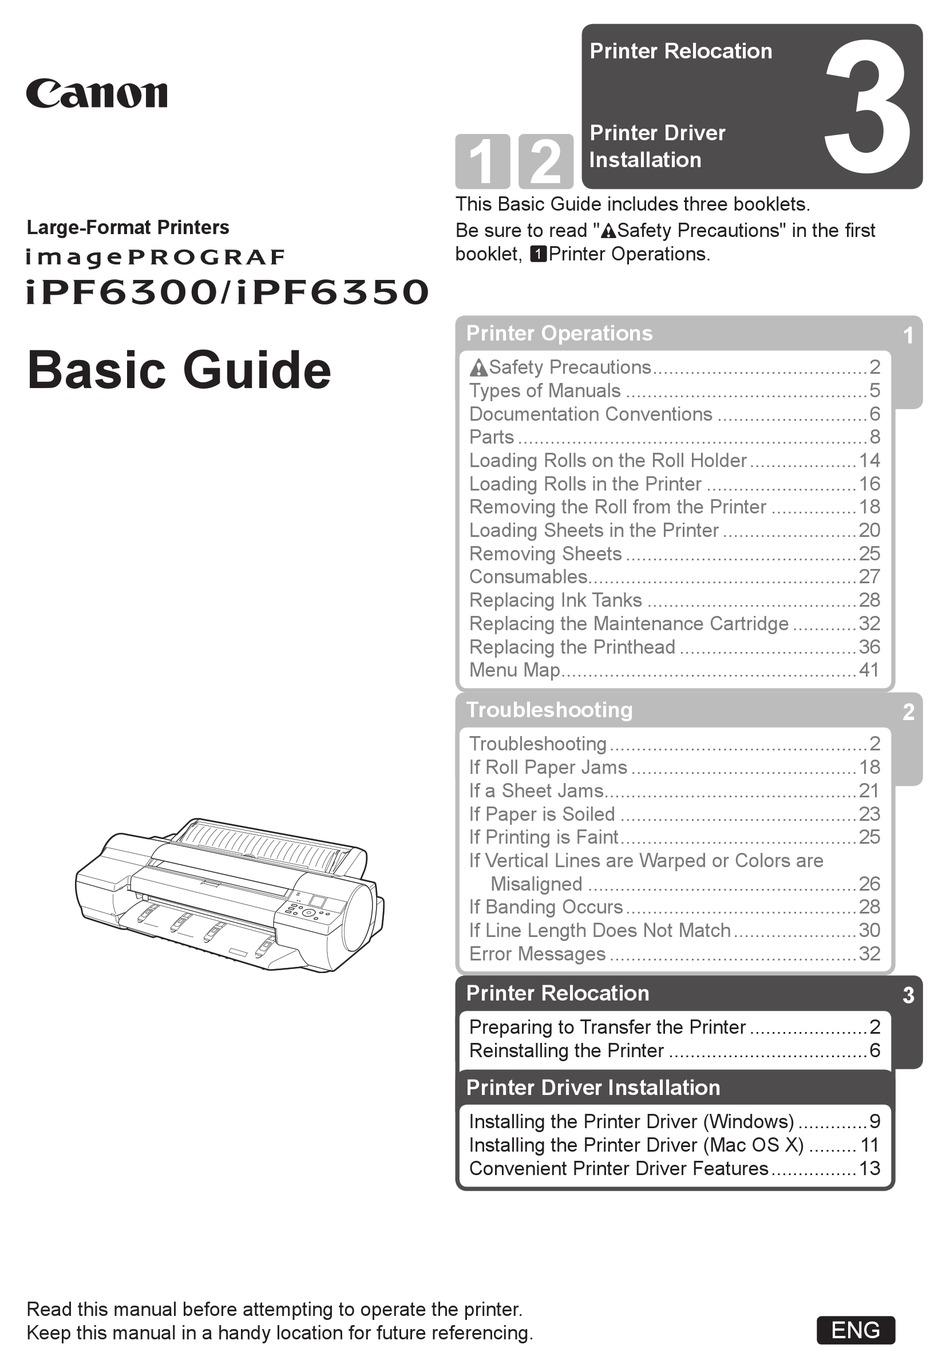 Archery Basics Manual Guide